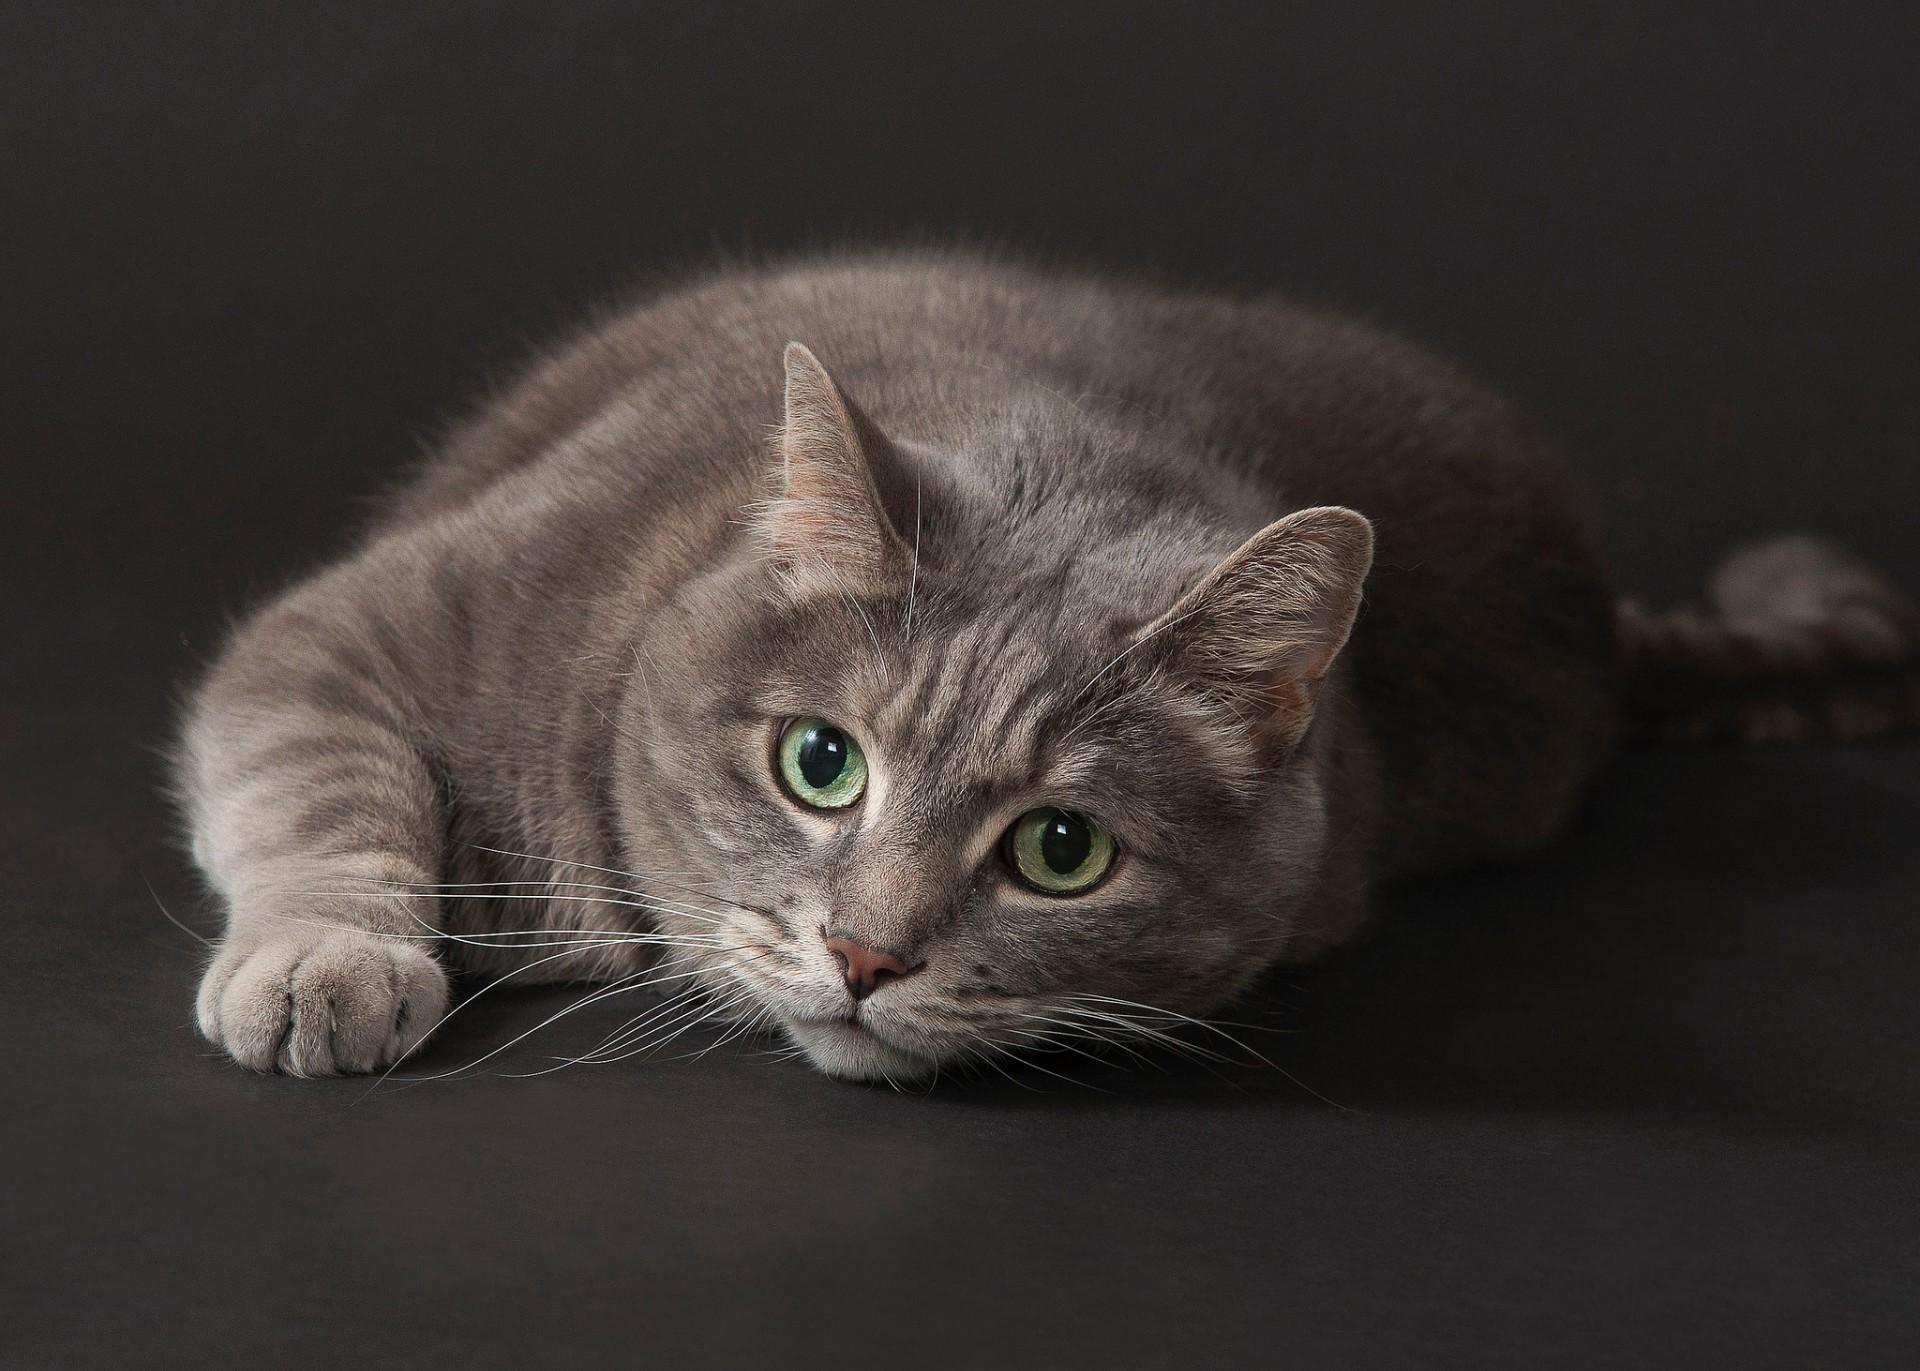 молодая картинки с серыми кошками на рабочий стол фомина